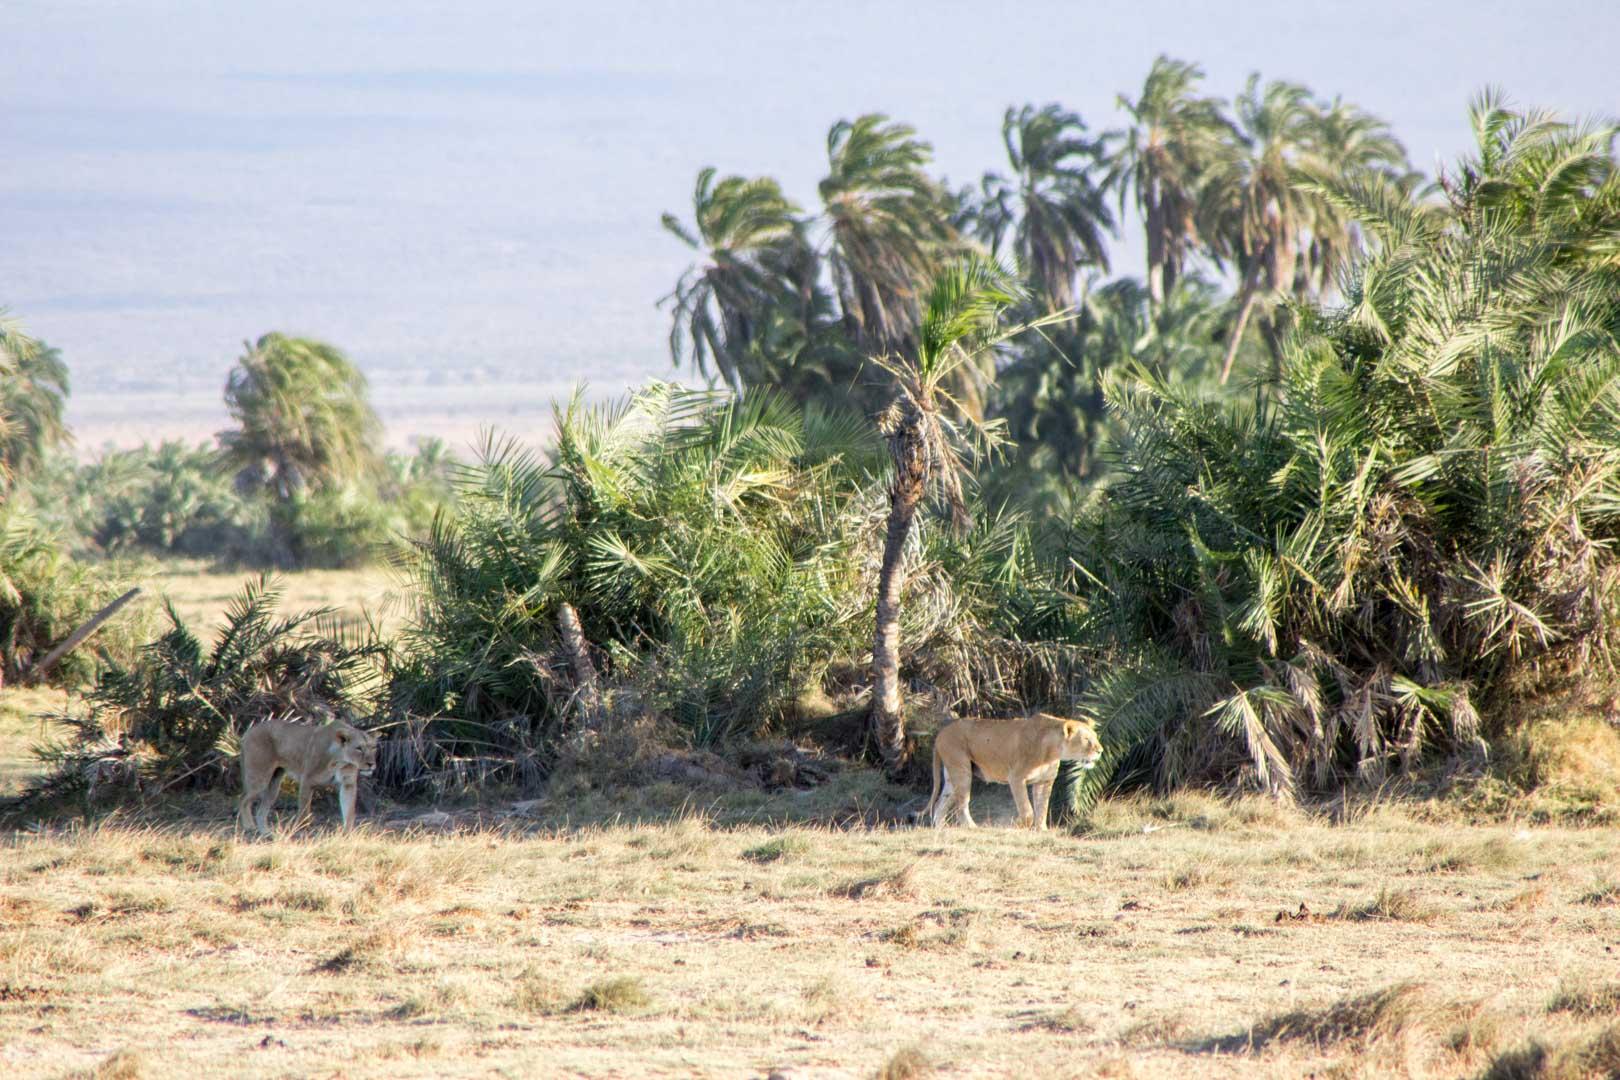 Dos leonas, Parque Nacional de Amboseli, Kenia